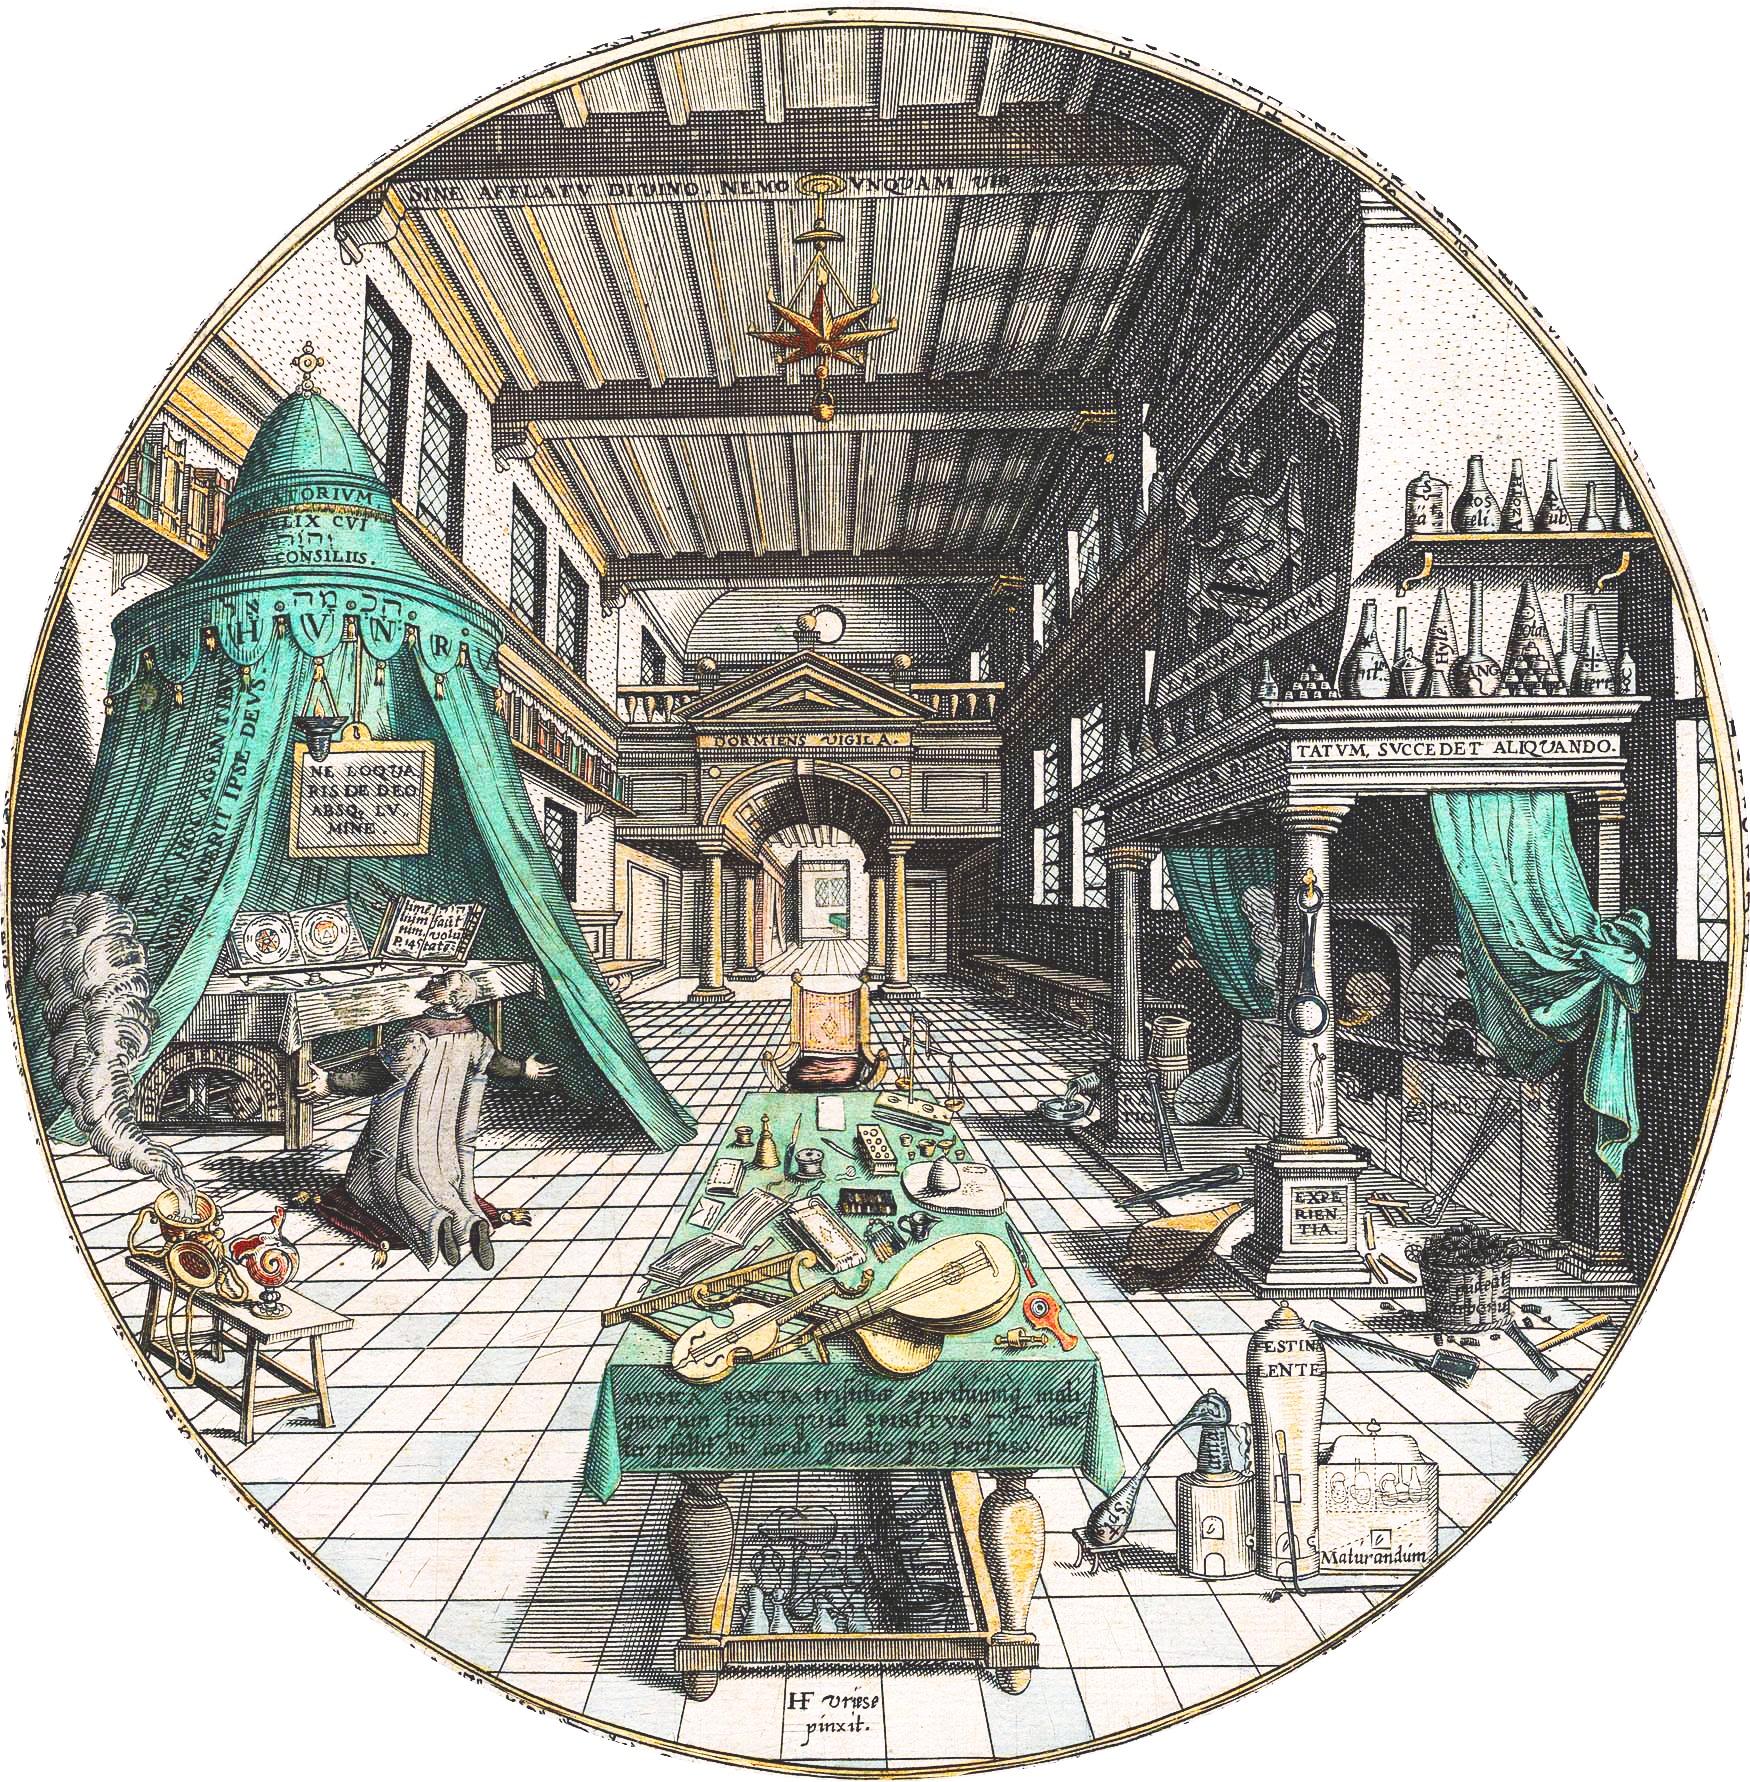 File:Alchemist's Laboratory, Heinrich Khunrath, Amphitheatrum sapientiae  aeternae, 1595 c.jpg - Wikimedia Commons